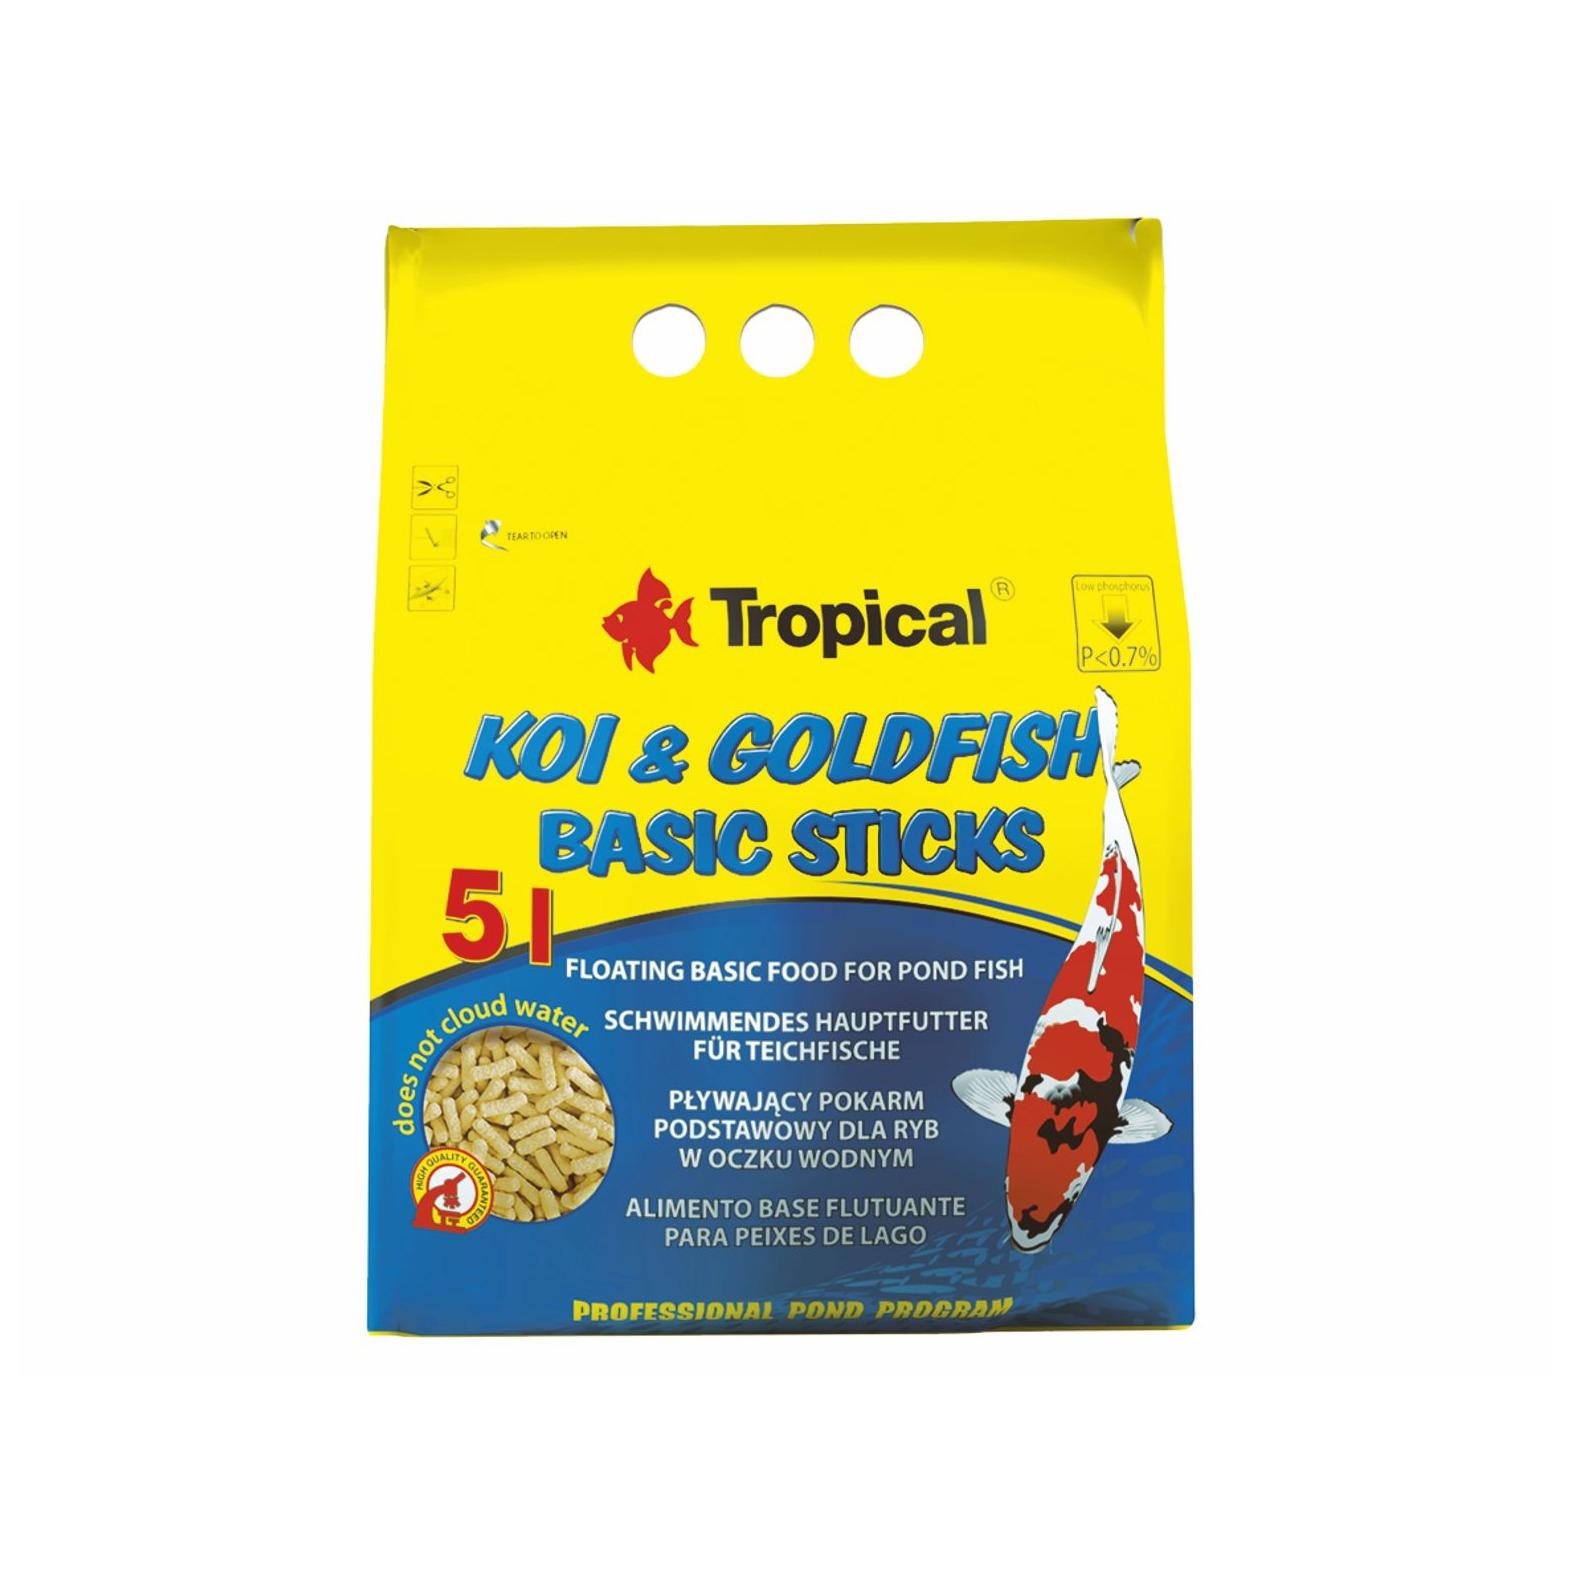 Tropical pond koi goldfish basic sticks 5l for Koi pond basics